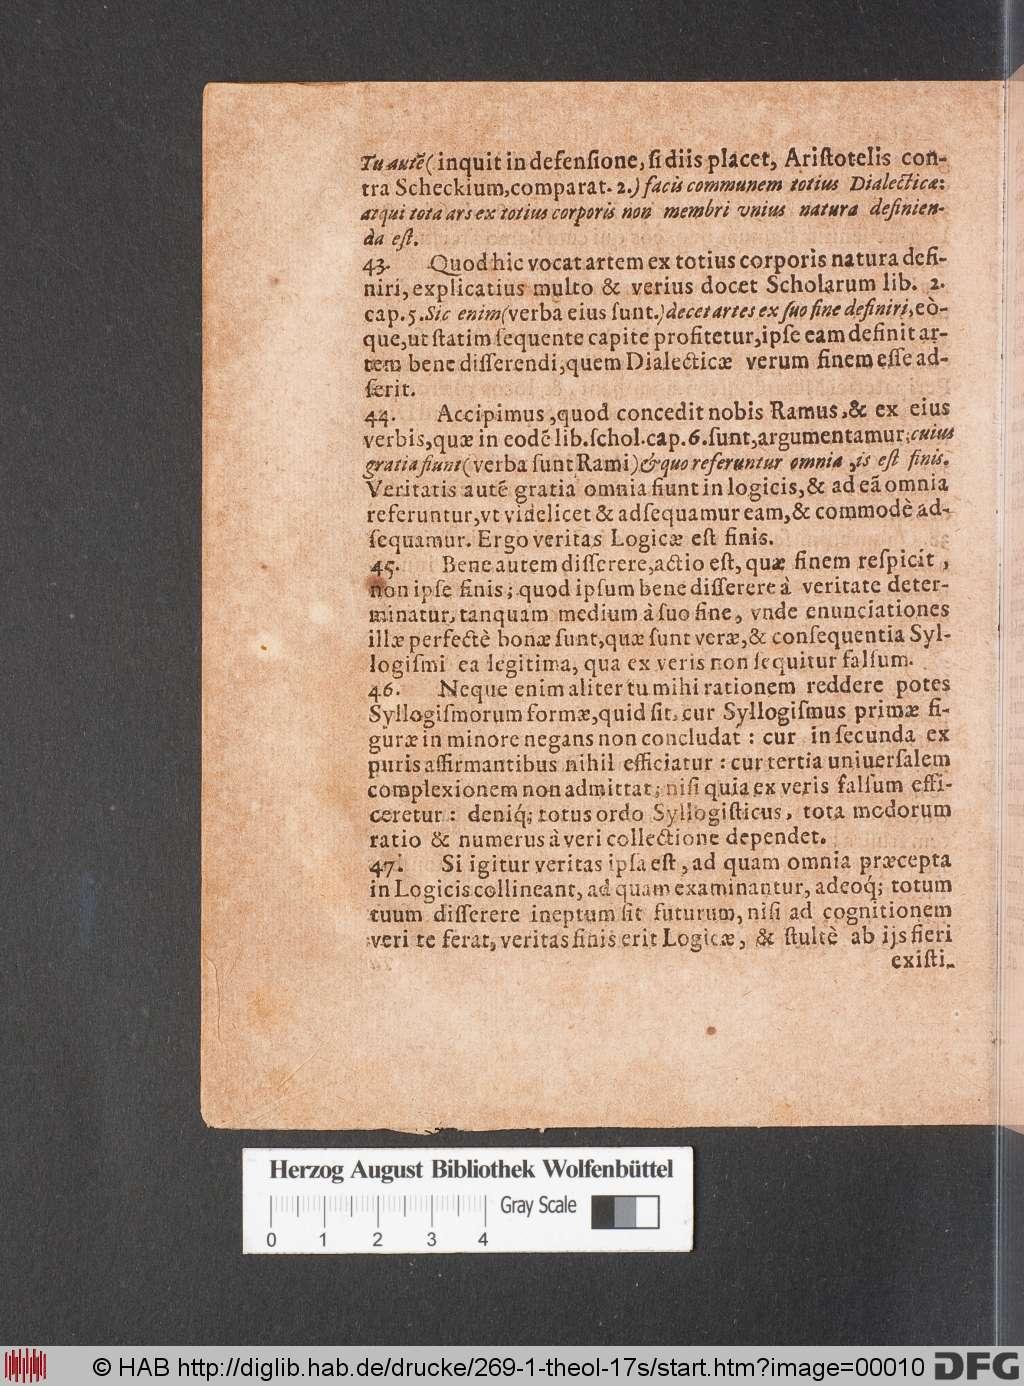 http://diglib.hab.de/drucke/269-1-theol-17s/00010.jpg